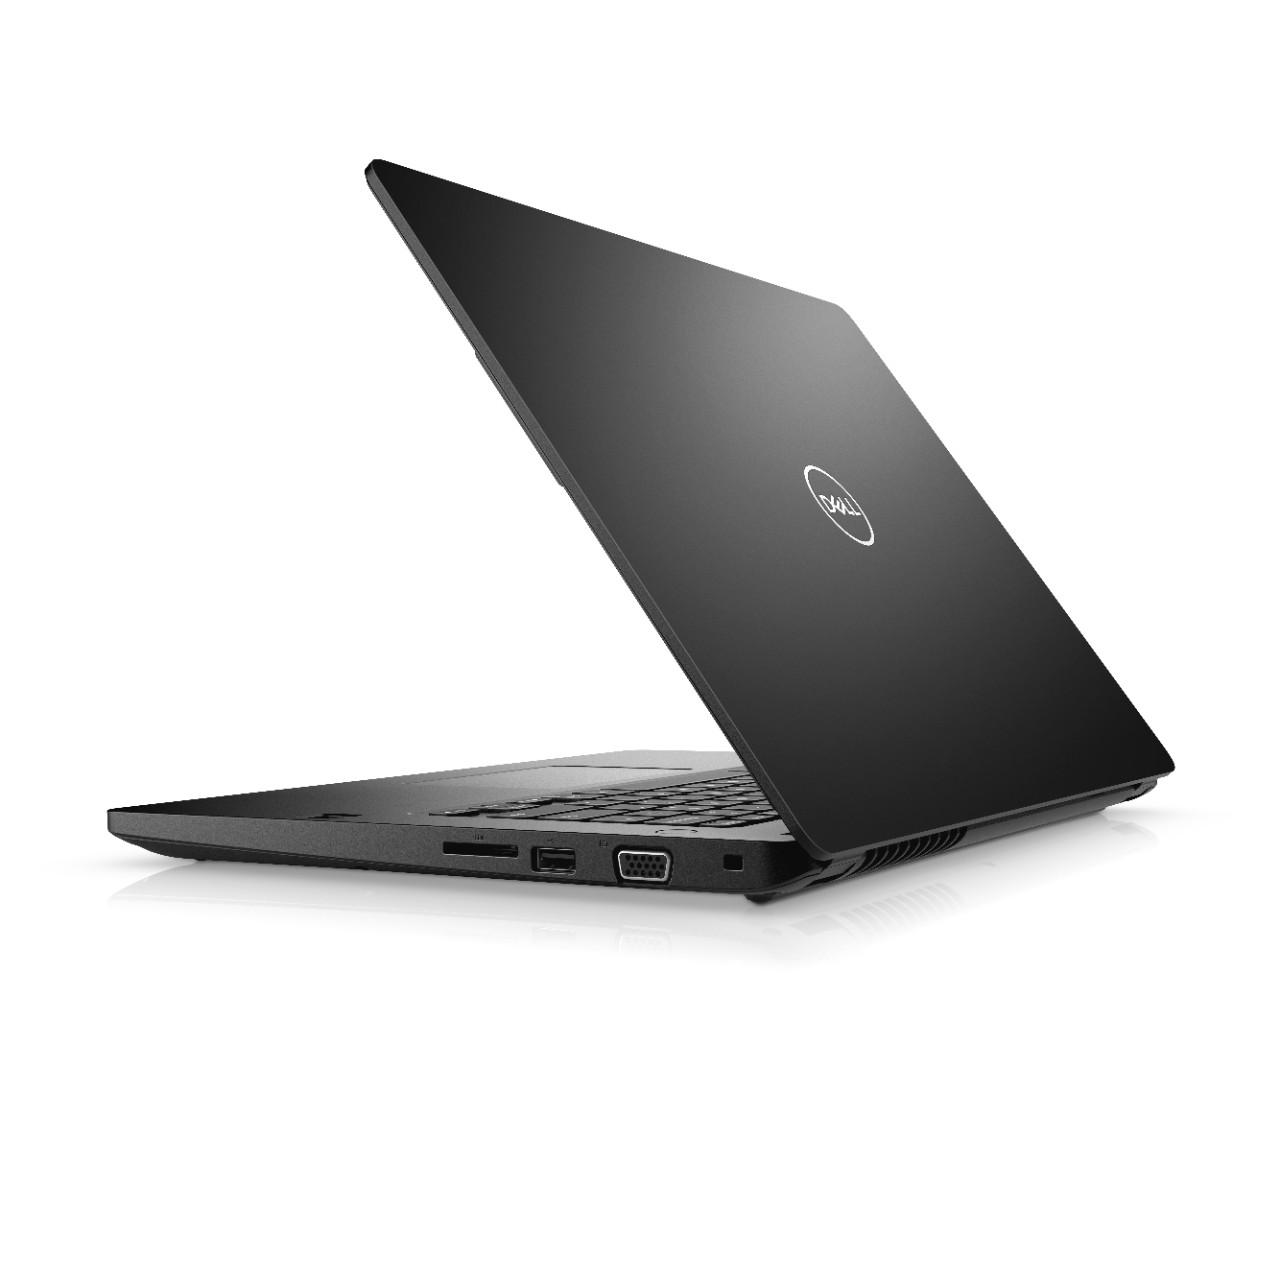 "Dell Latitude 3480 14"" HD i5-6200U/4GB/500GB/FPR/MCR/VGA/HDMI/W10P/3RNBD/Černý"